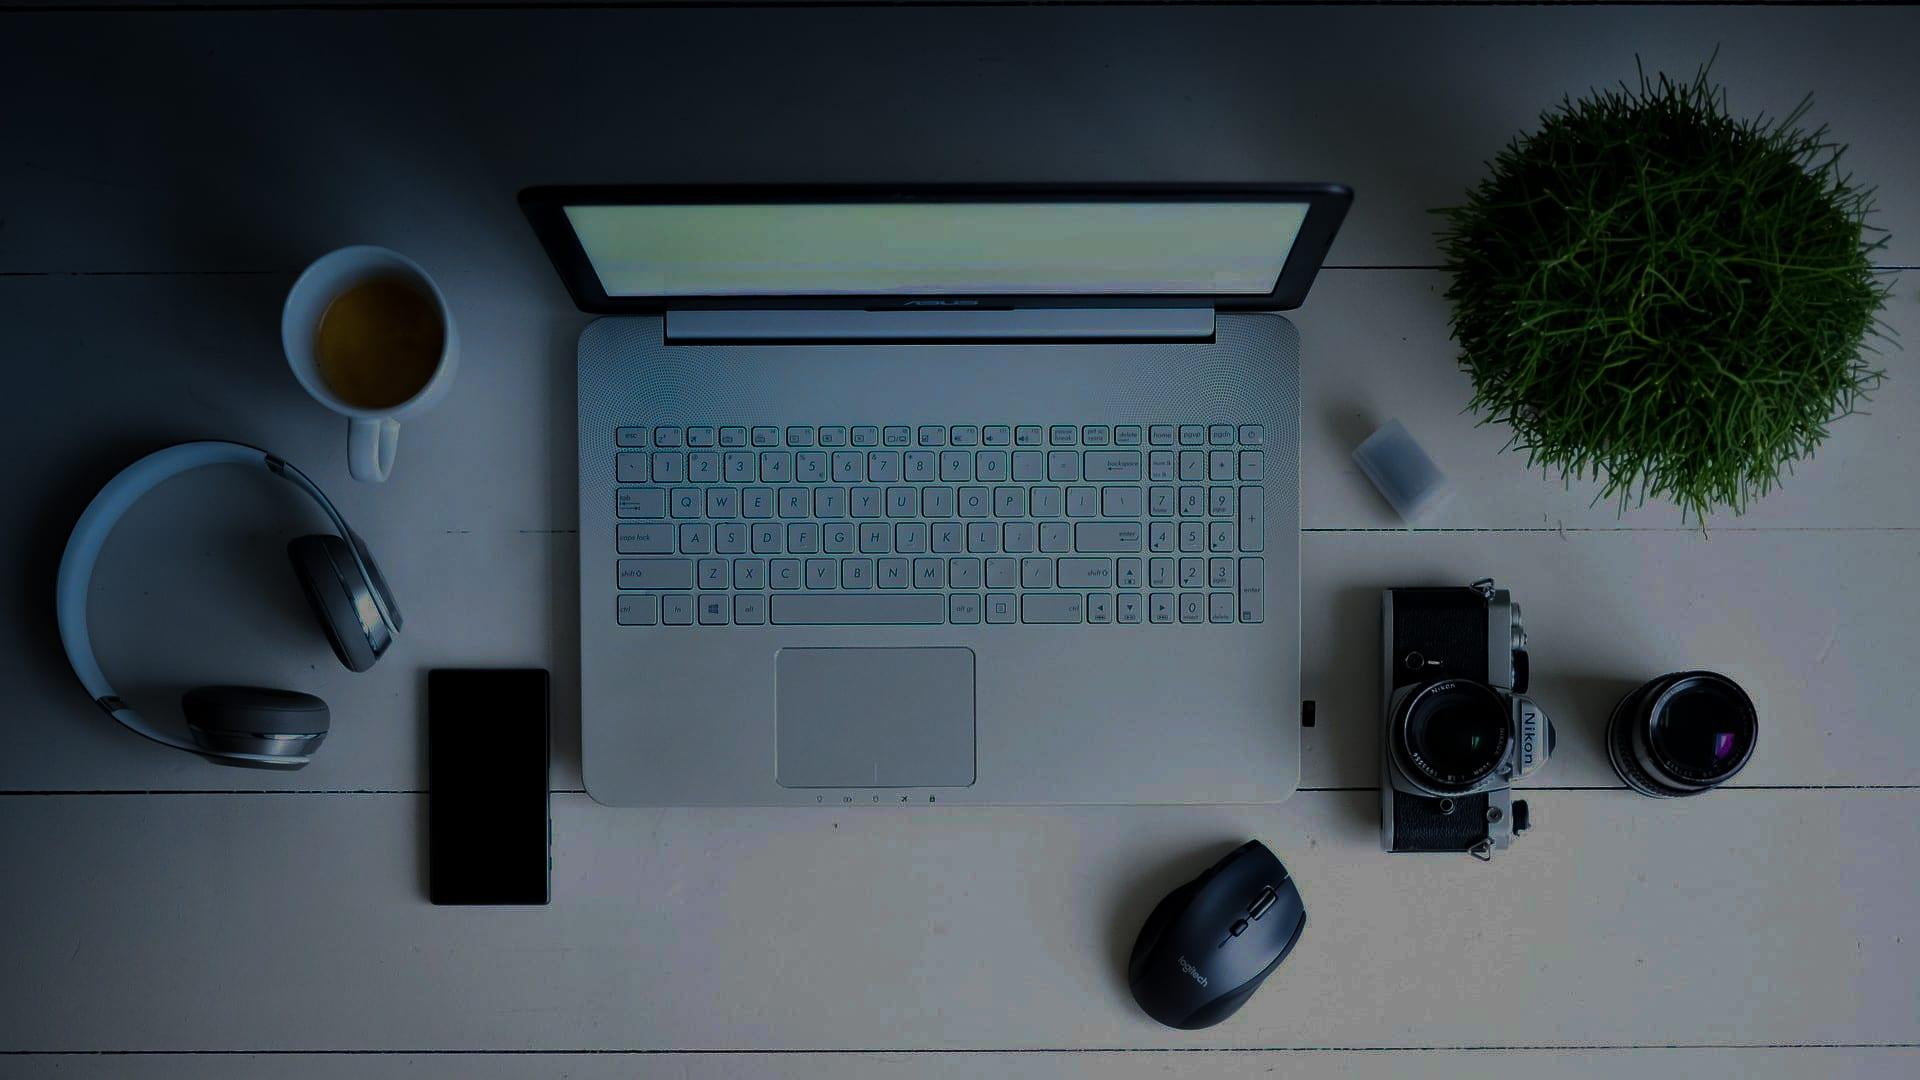 Mac vs. Windows for Video & Photo Editing